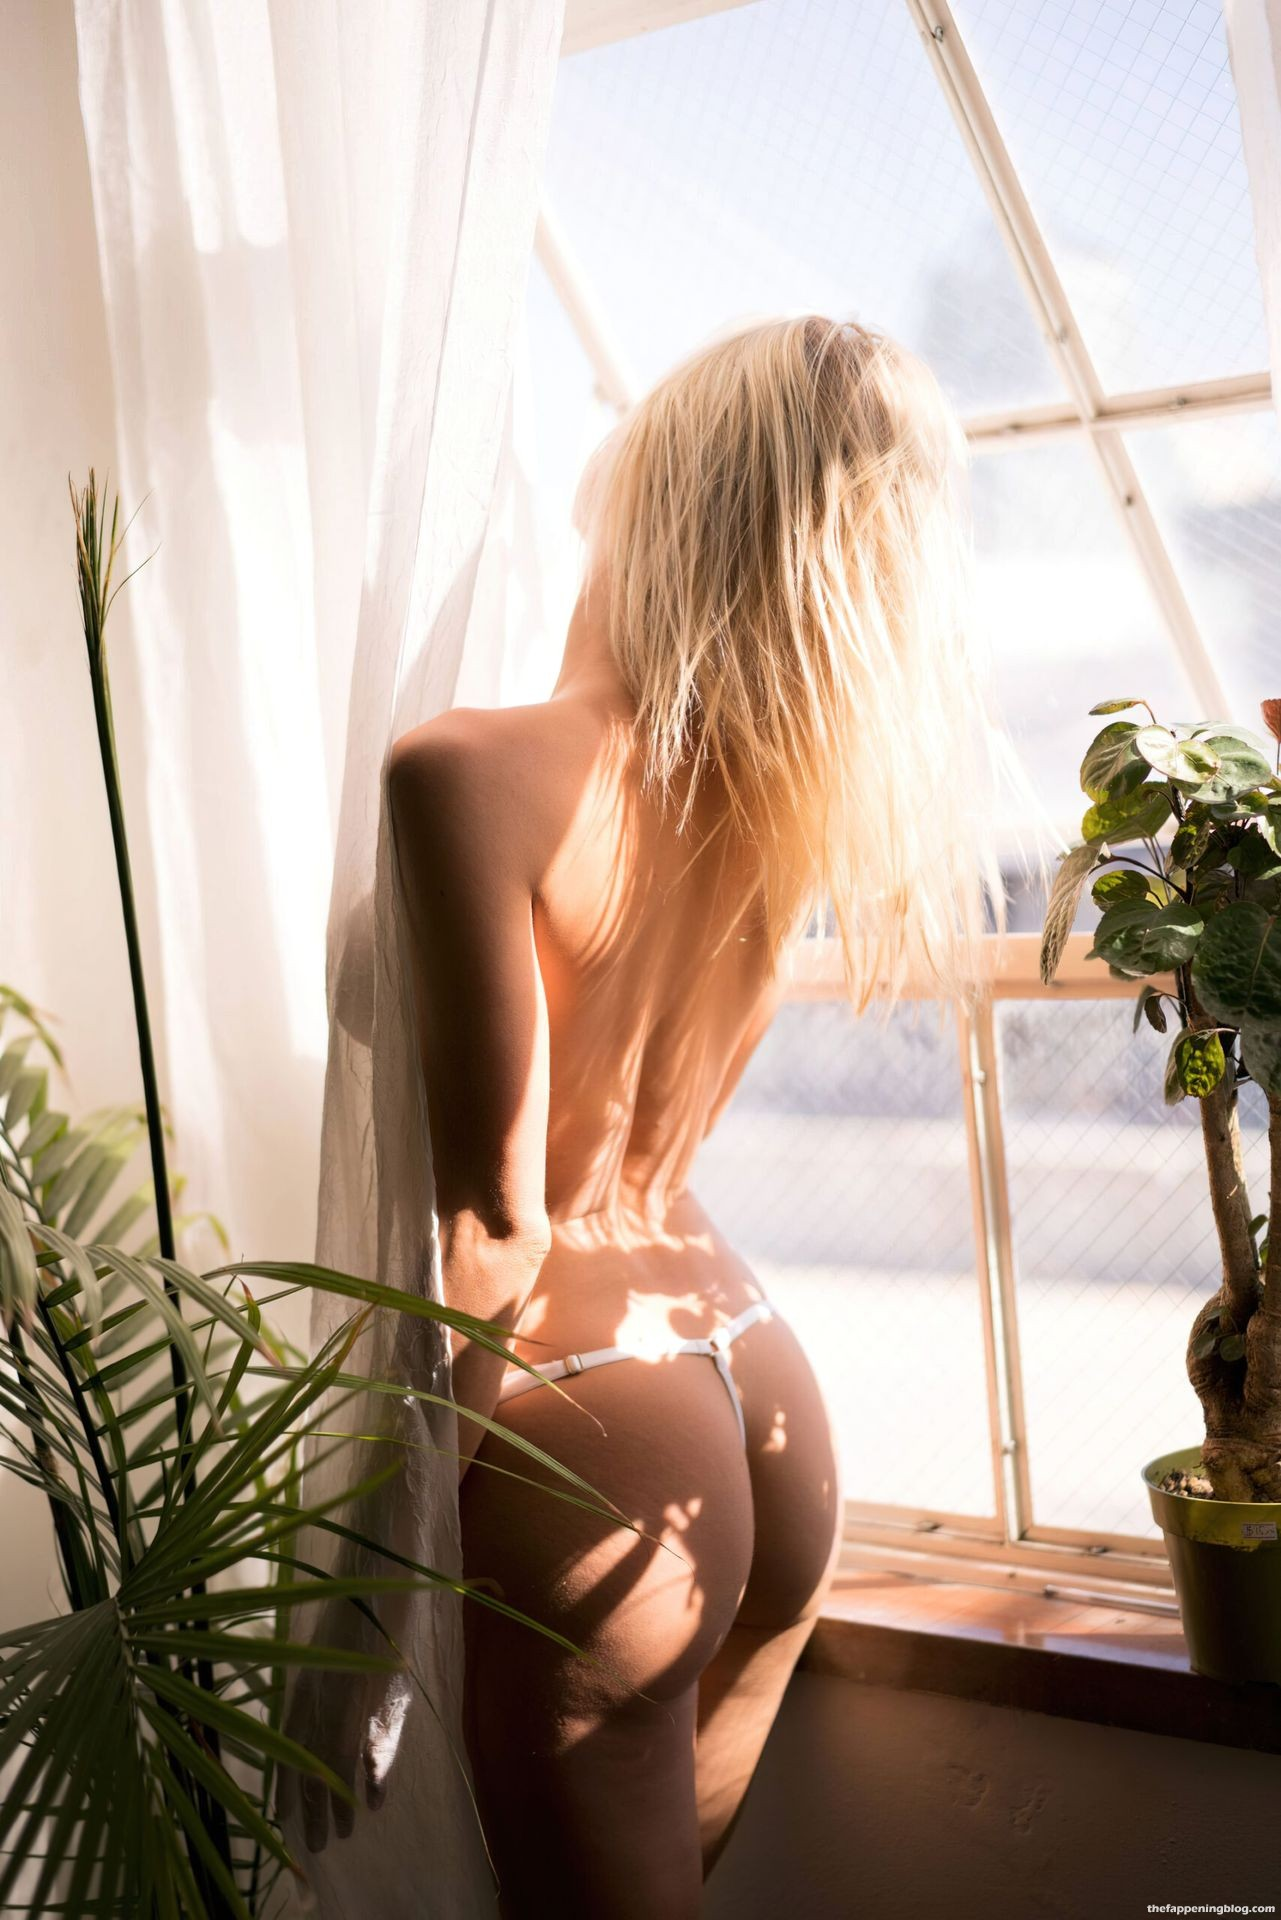 Joy-Corrigan-Naked-Tits-and-Ass-18-scaled1-thefappeningblog.com_.jpg